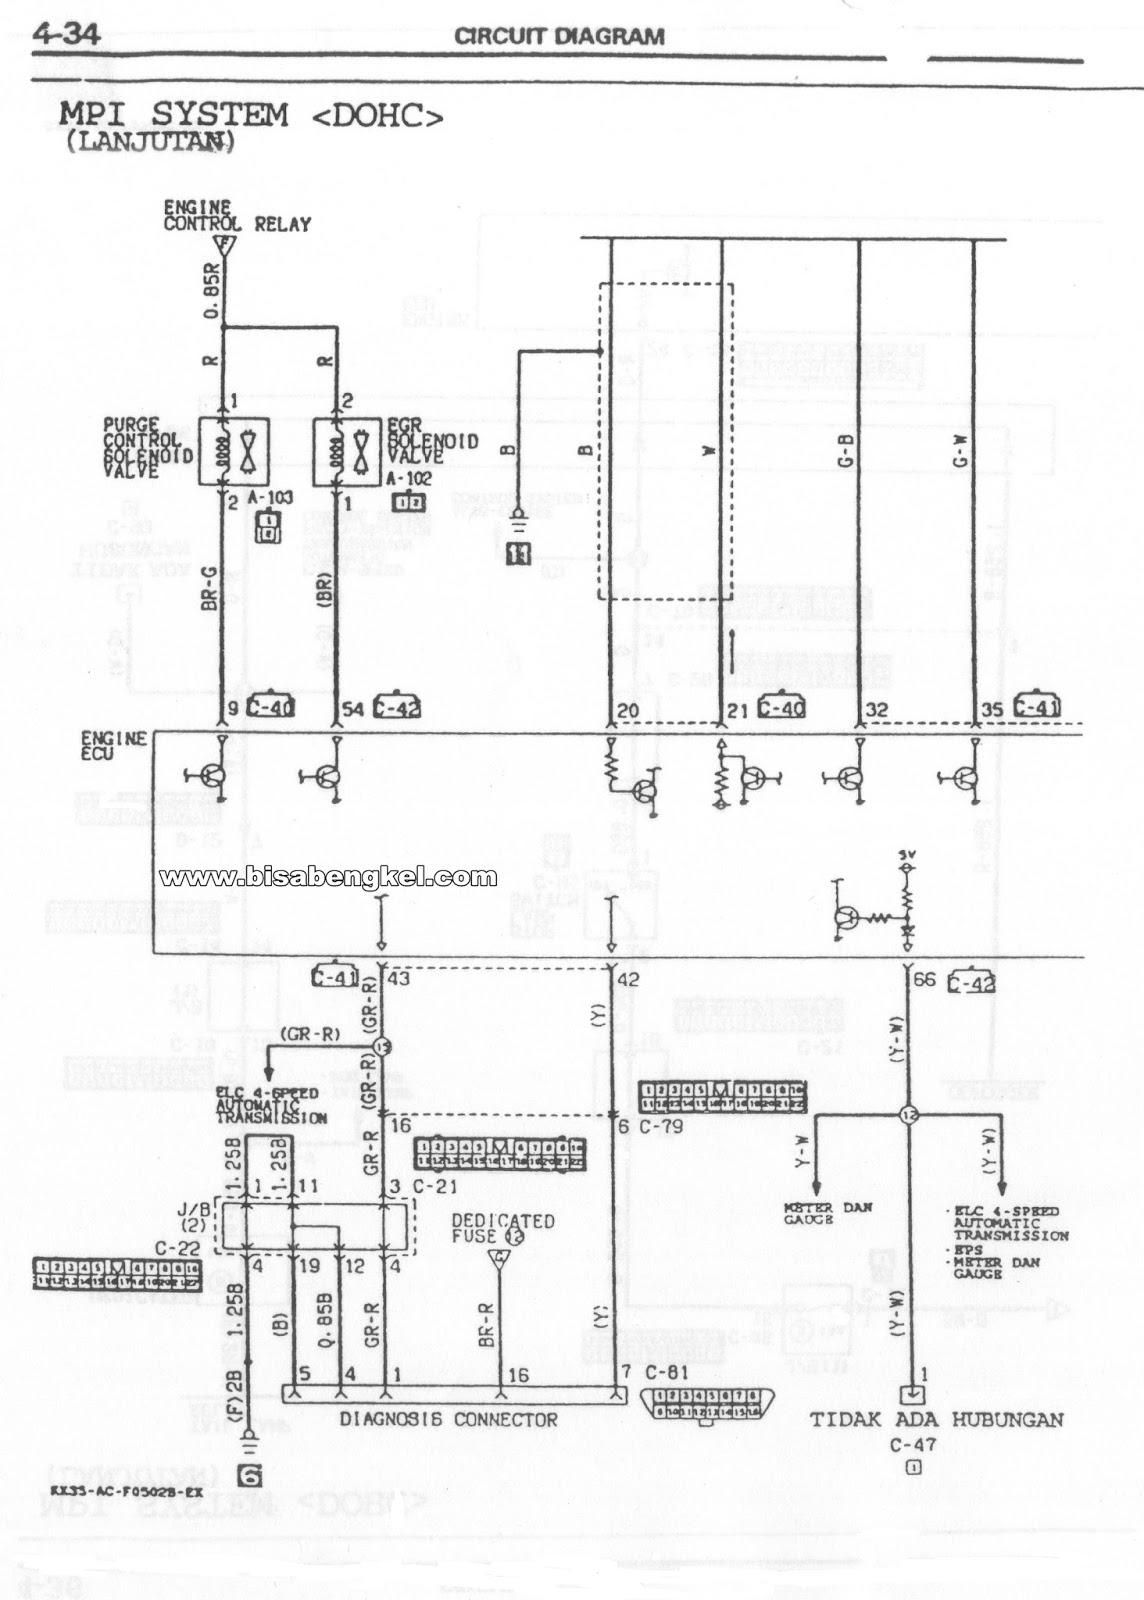 50+ Wiring diagram mitsubishi colt t120ss information